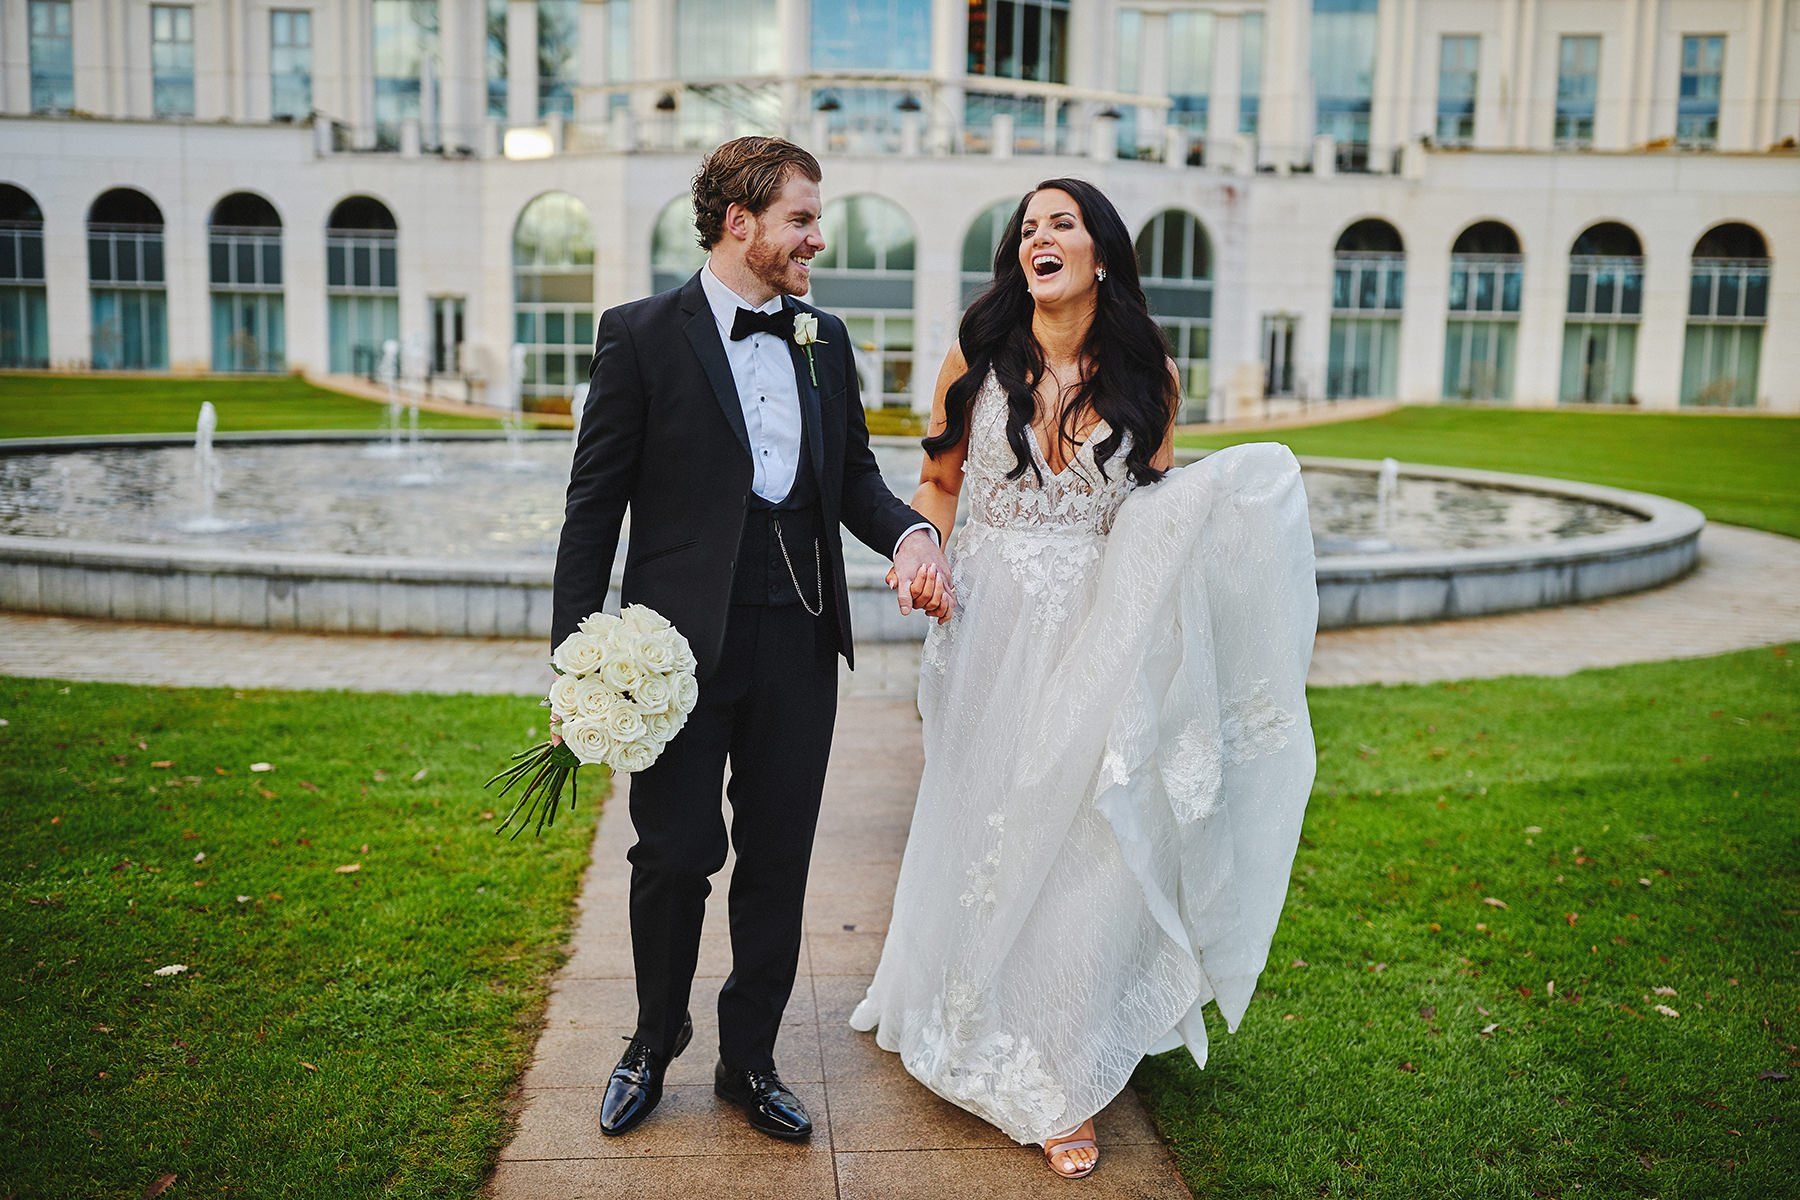 POWERSCOURT HOTEL RESORT INTIMATE WEDDING 76